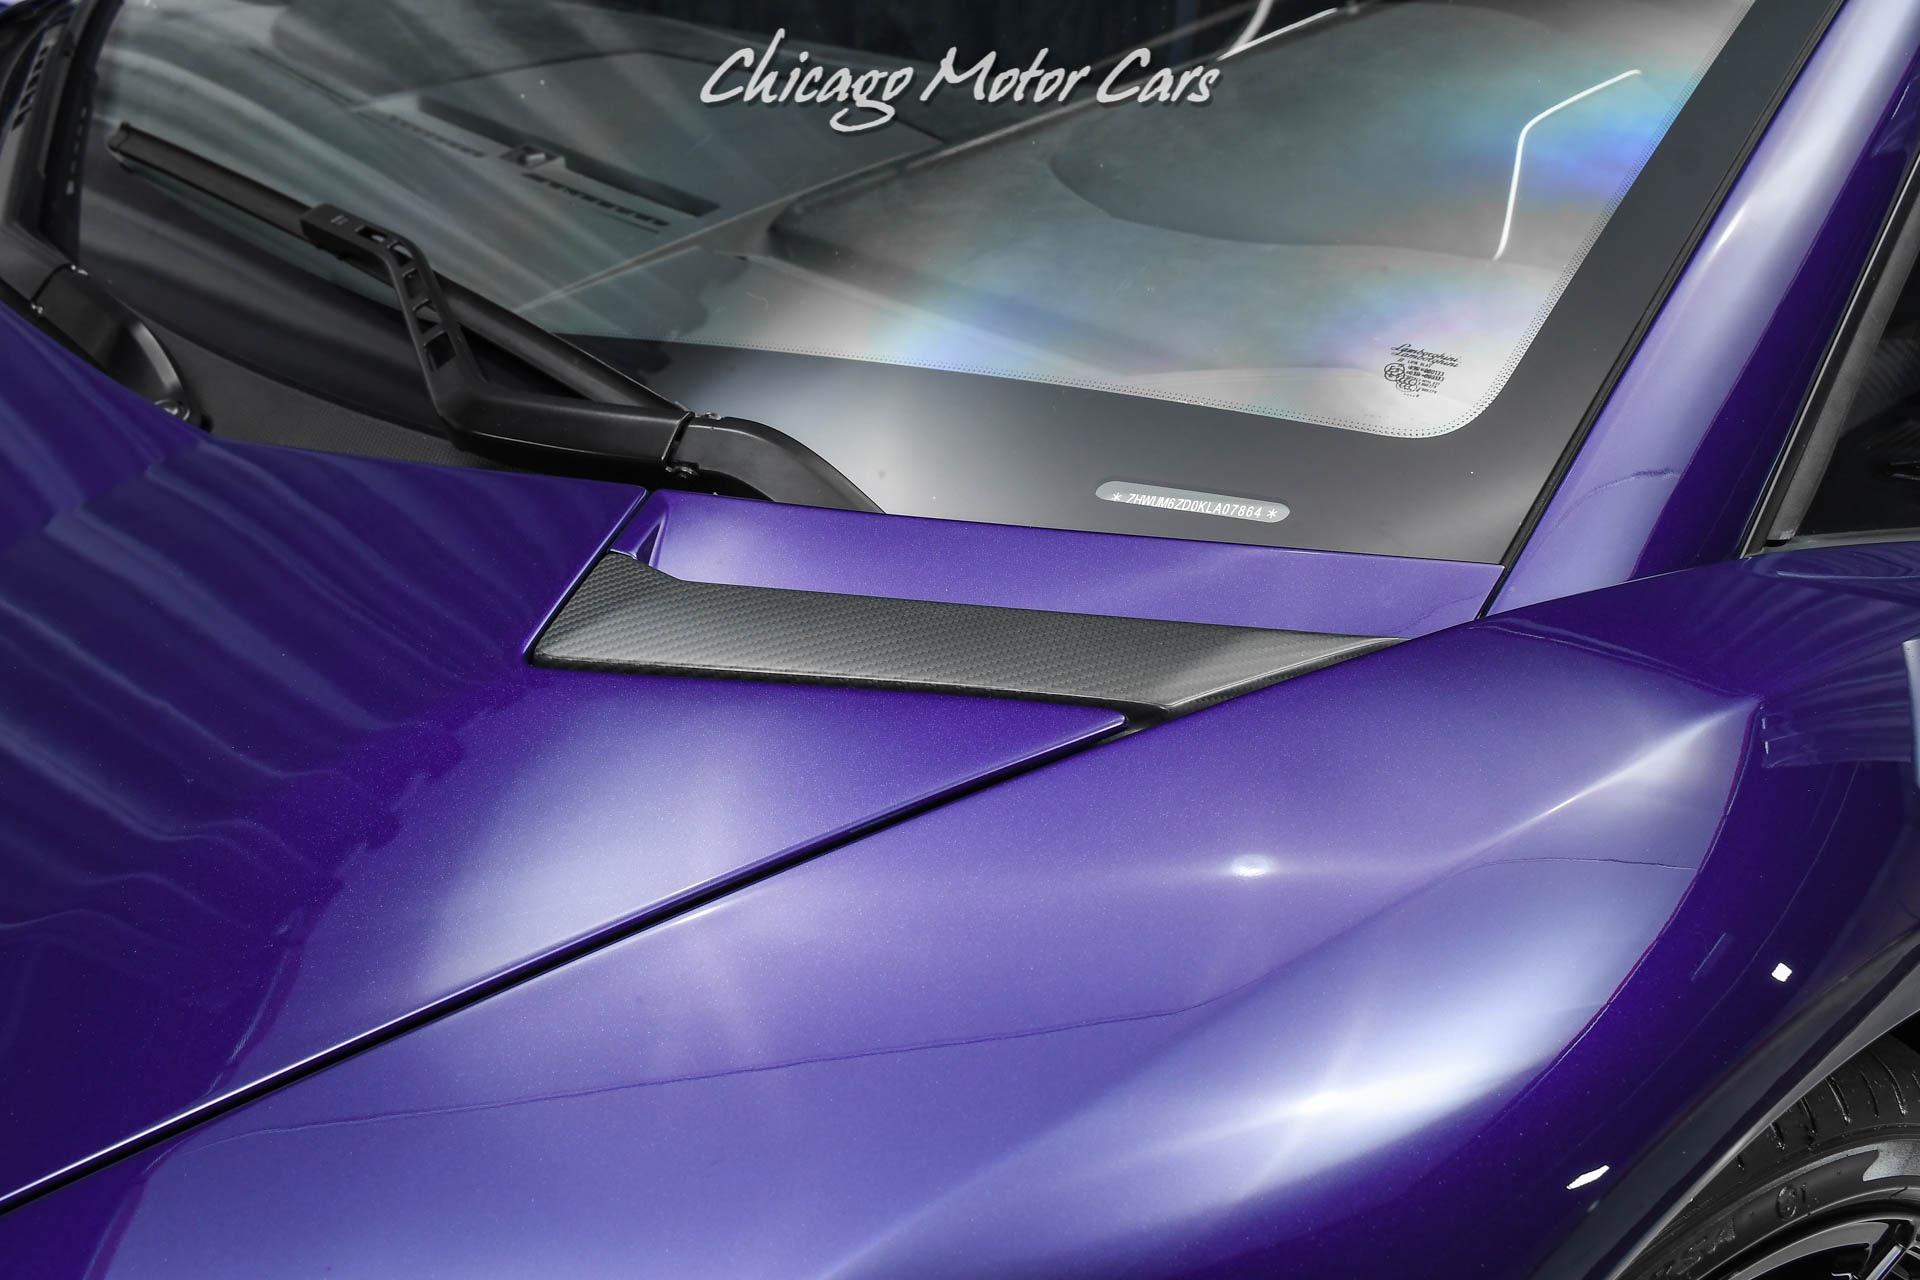 Used-2019-Lamborghini-Aventador-LP-770-4-SVJ-Coupe-RARE-Viola-Aletheia-Hot-Color-Combo-Carbon-Fiber